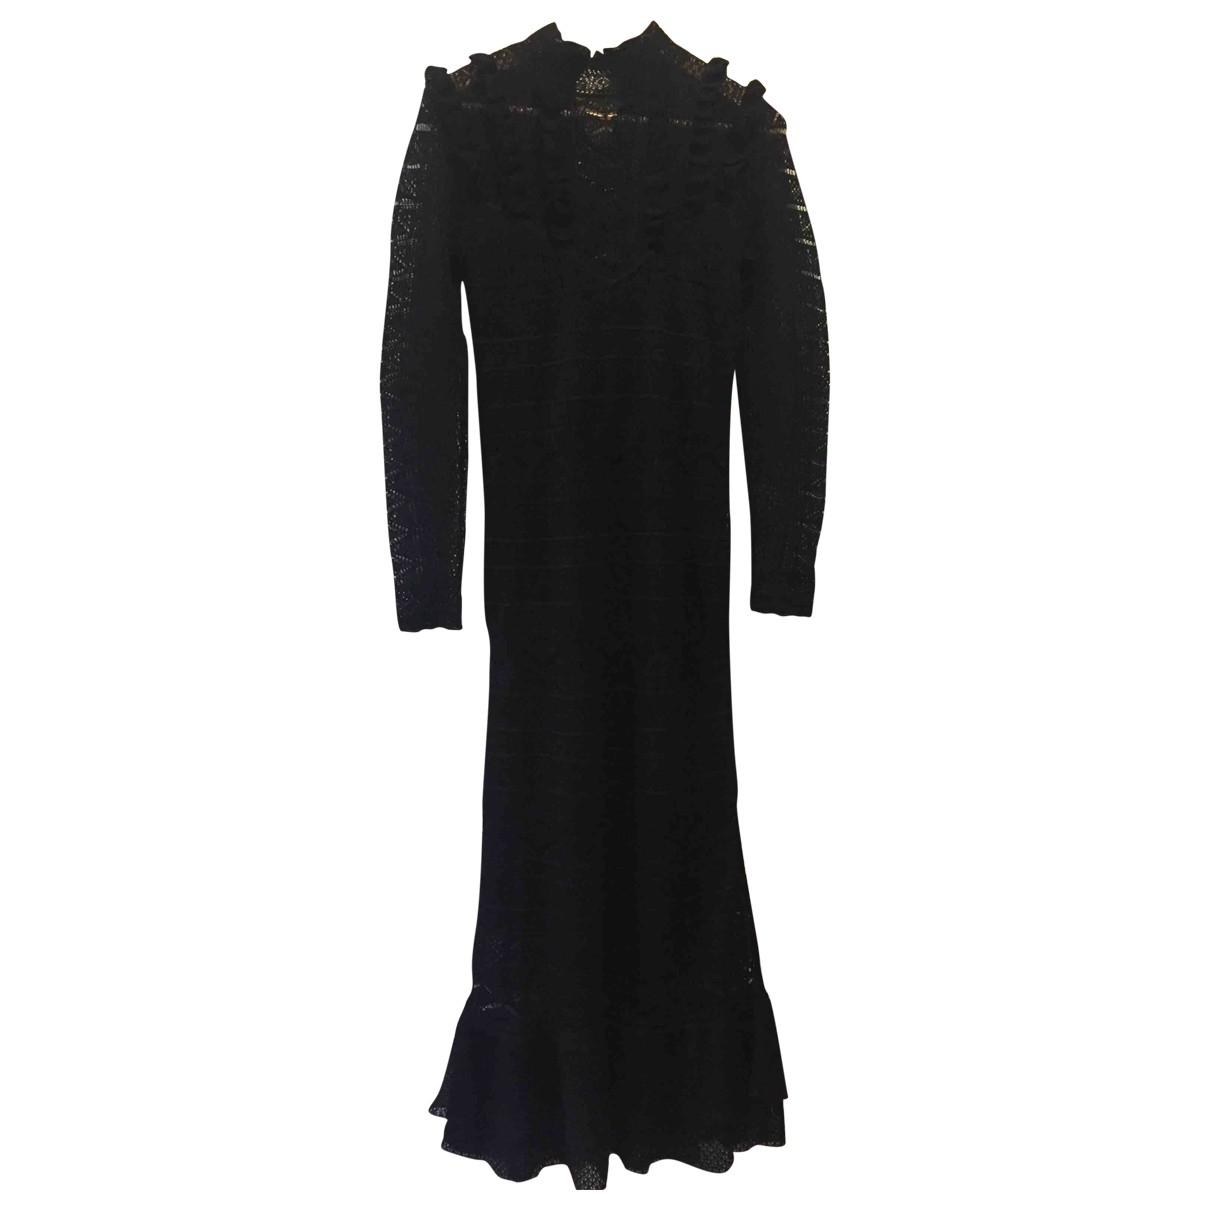 Polo Ralph Lauren \N Black Cotton - elasthane dress for Women XS International